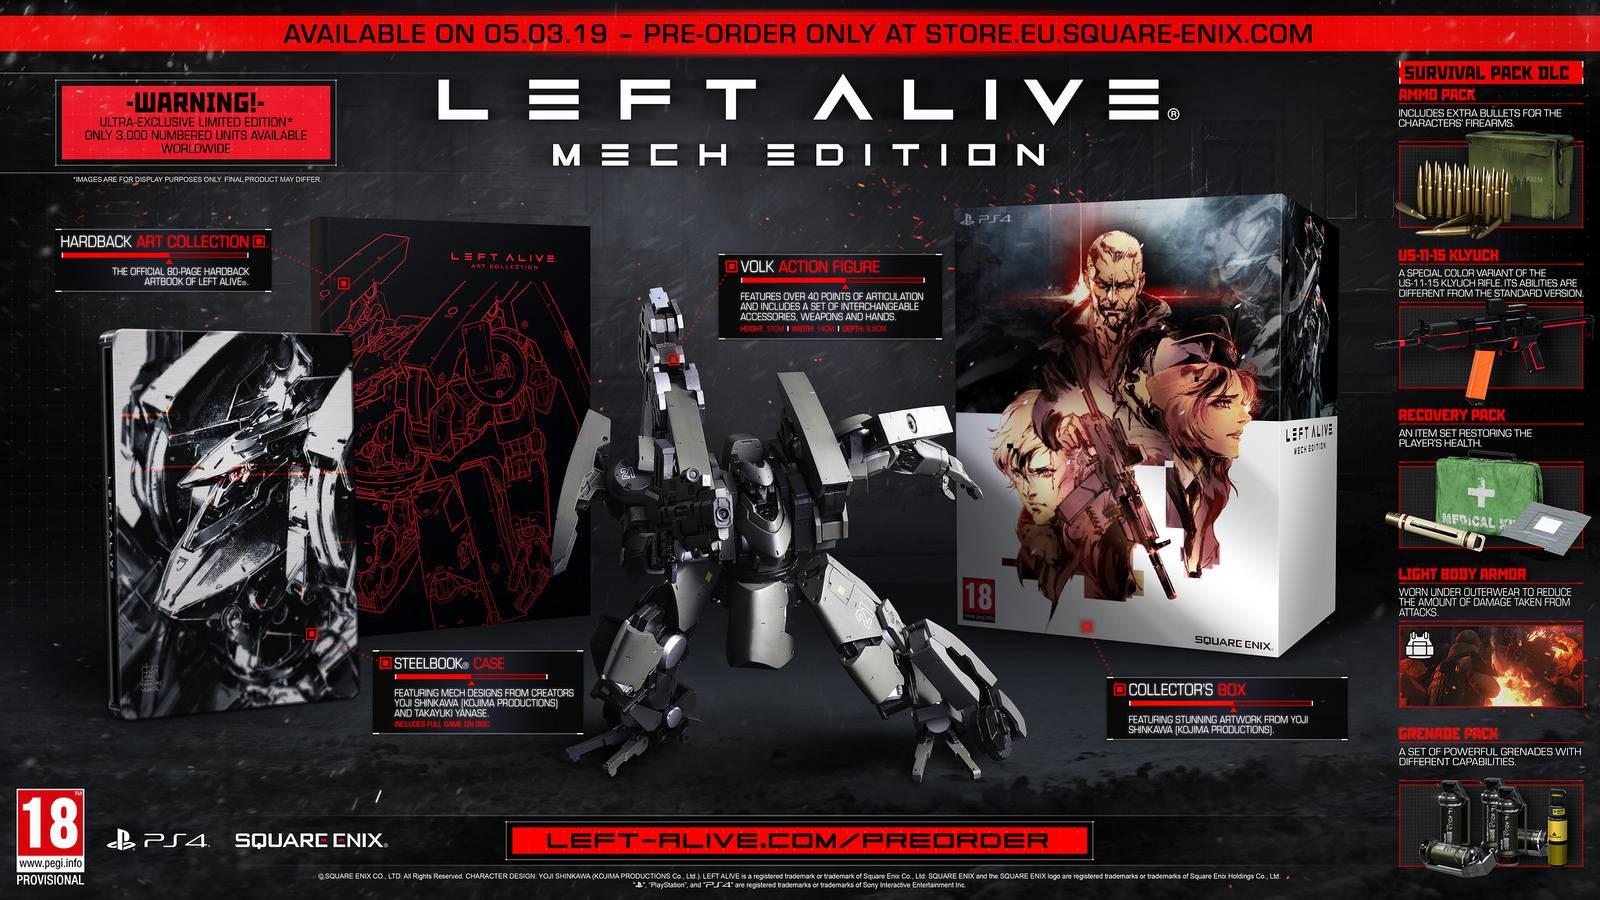 LEFT ALIVE νέος τίτλος από την Square Enix - Geekdom News 1